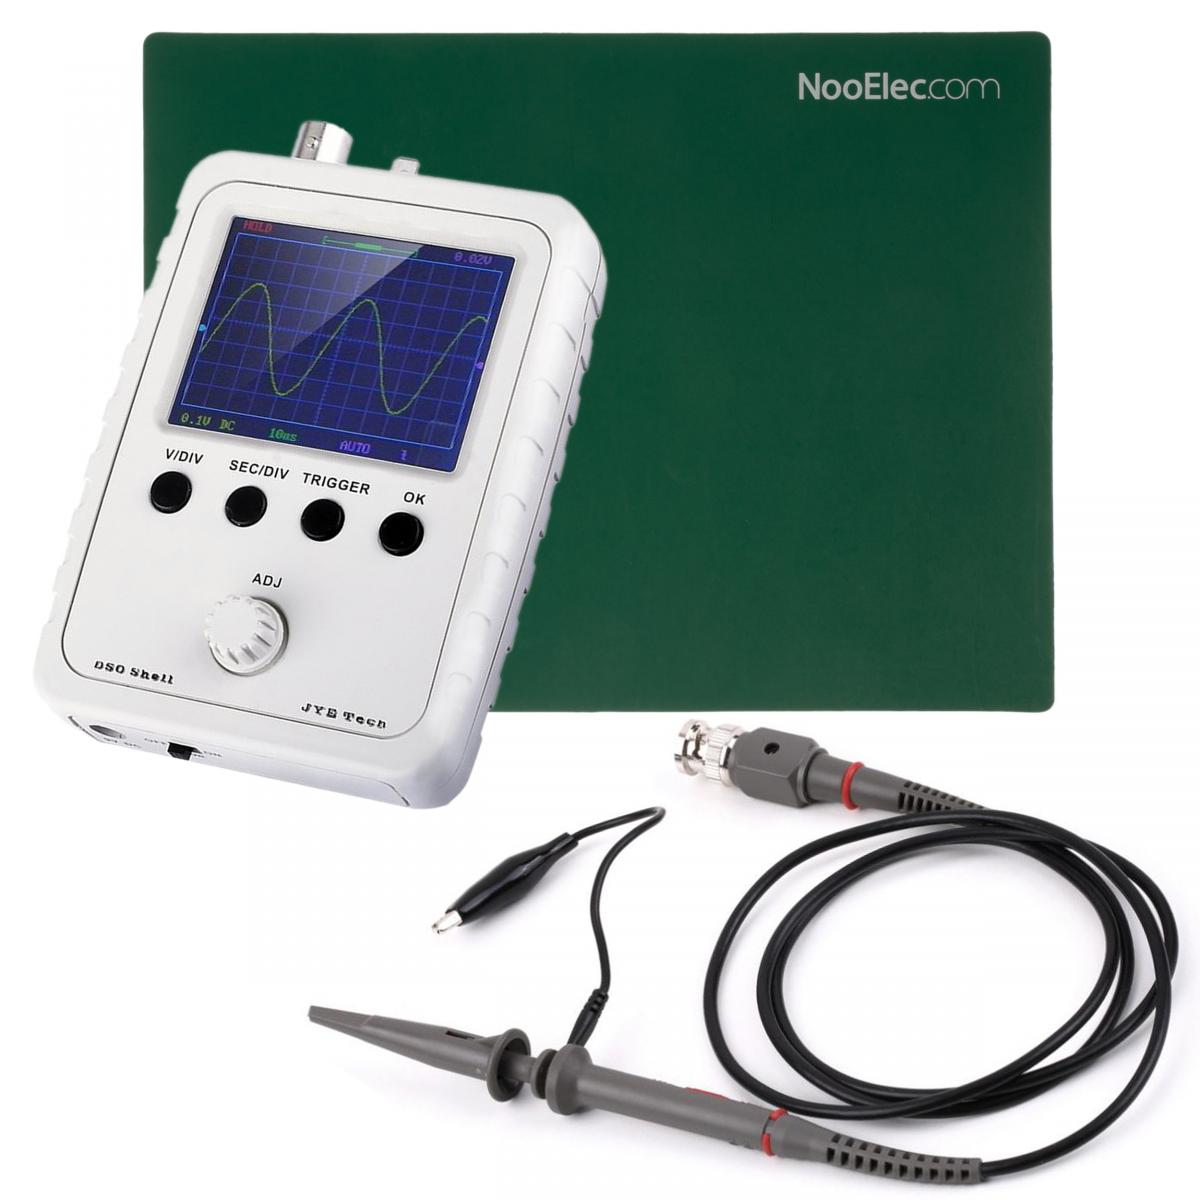 Nooelec Jyetech Dso Shell Oscilloscope Diy Kit Bundle